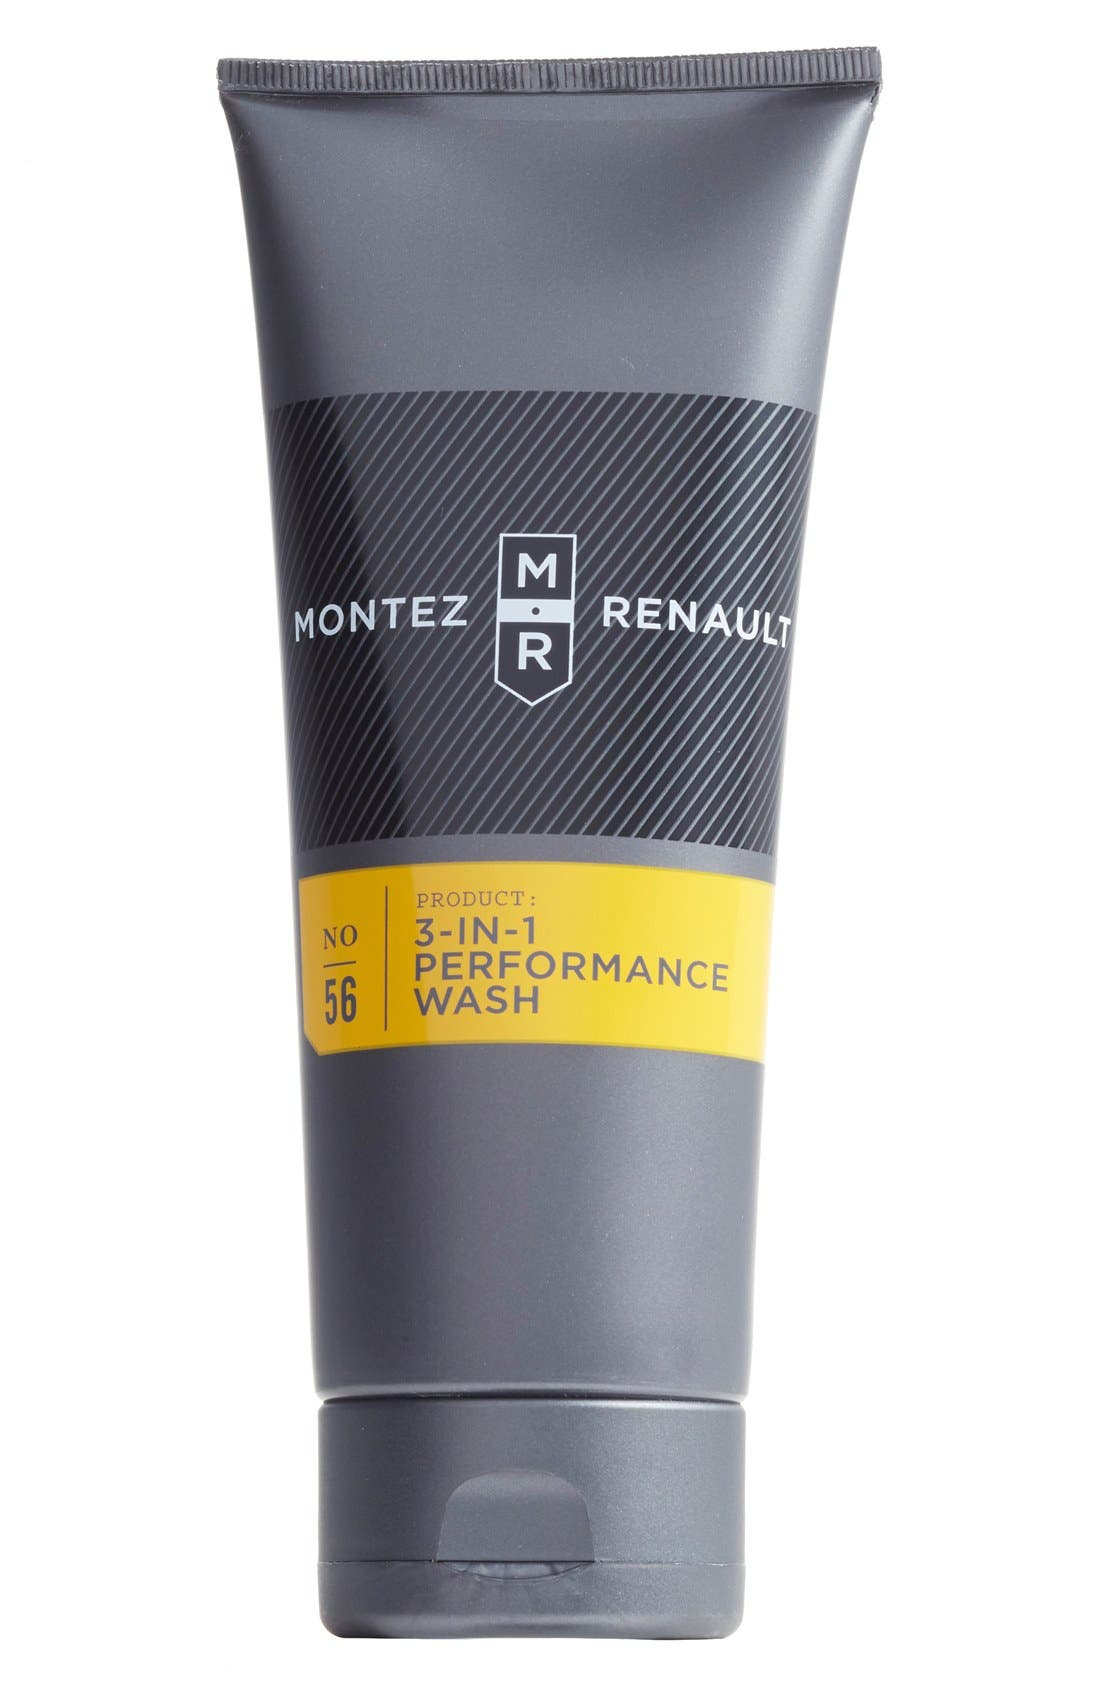 Montez Renault 'No. 56' 3-in-1 Performance Body Wash